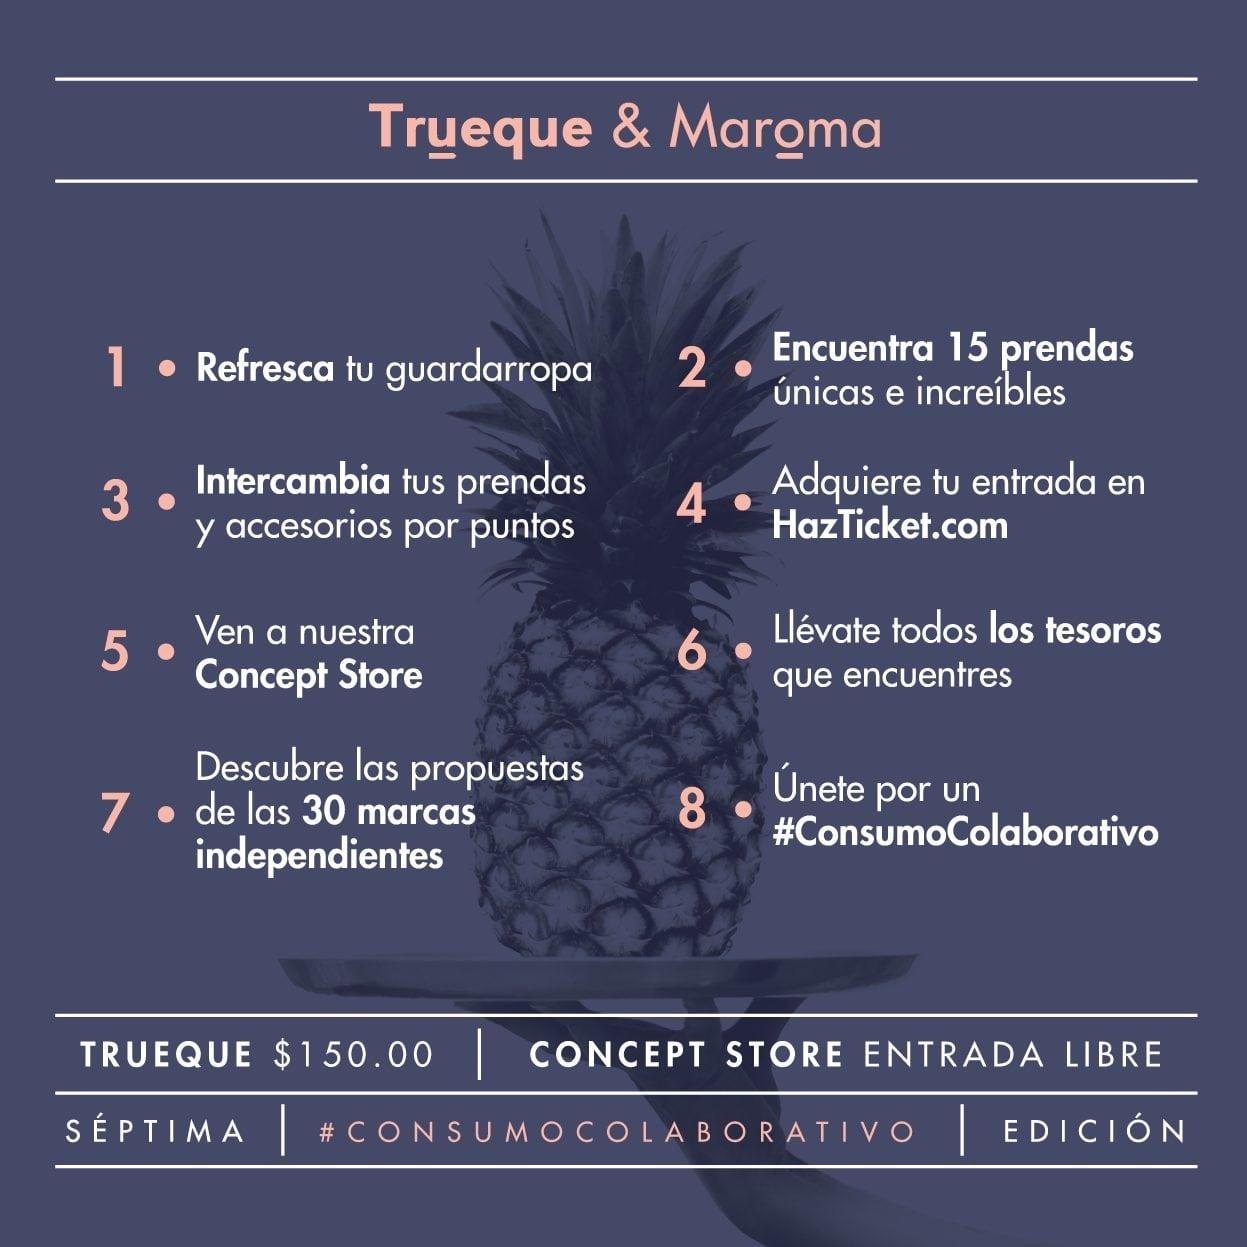 02 TM Invitacion Digital Vuelta